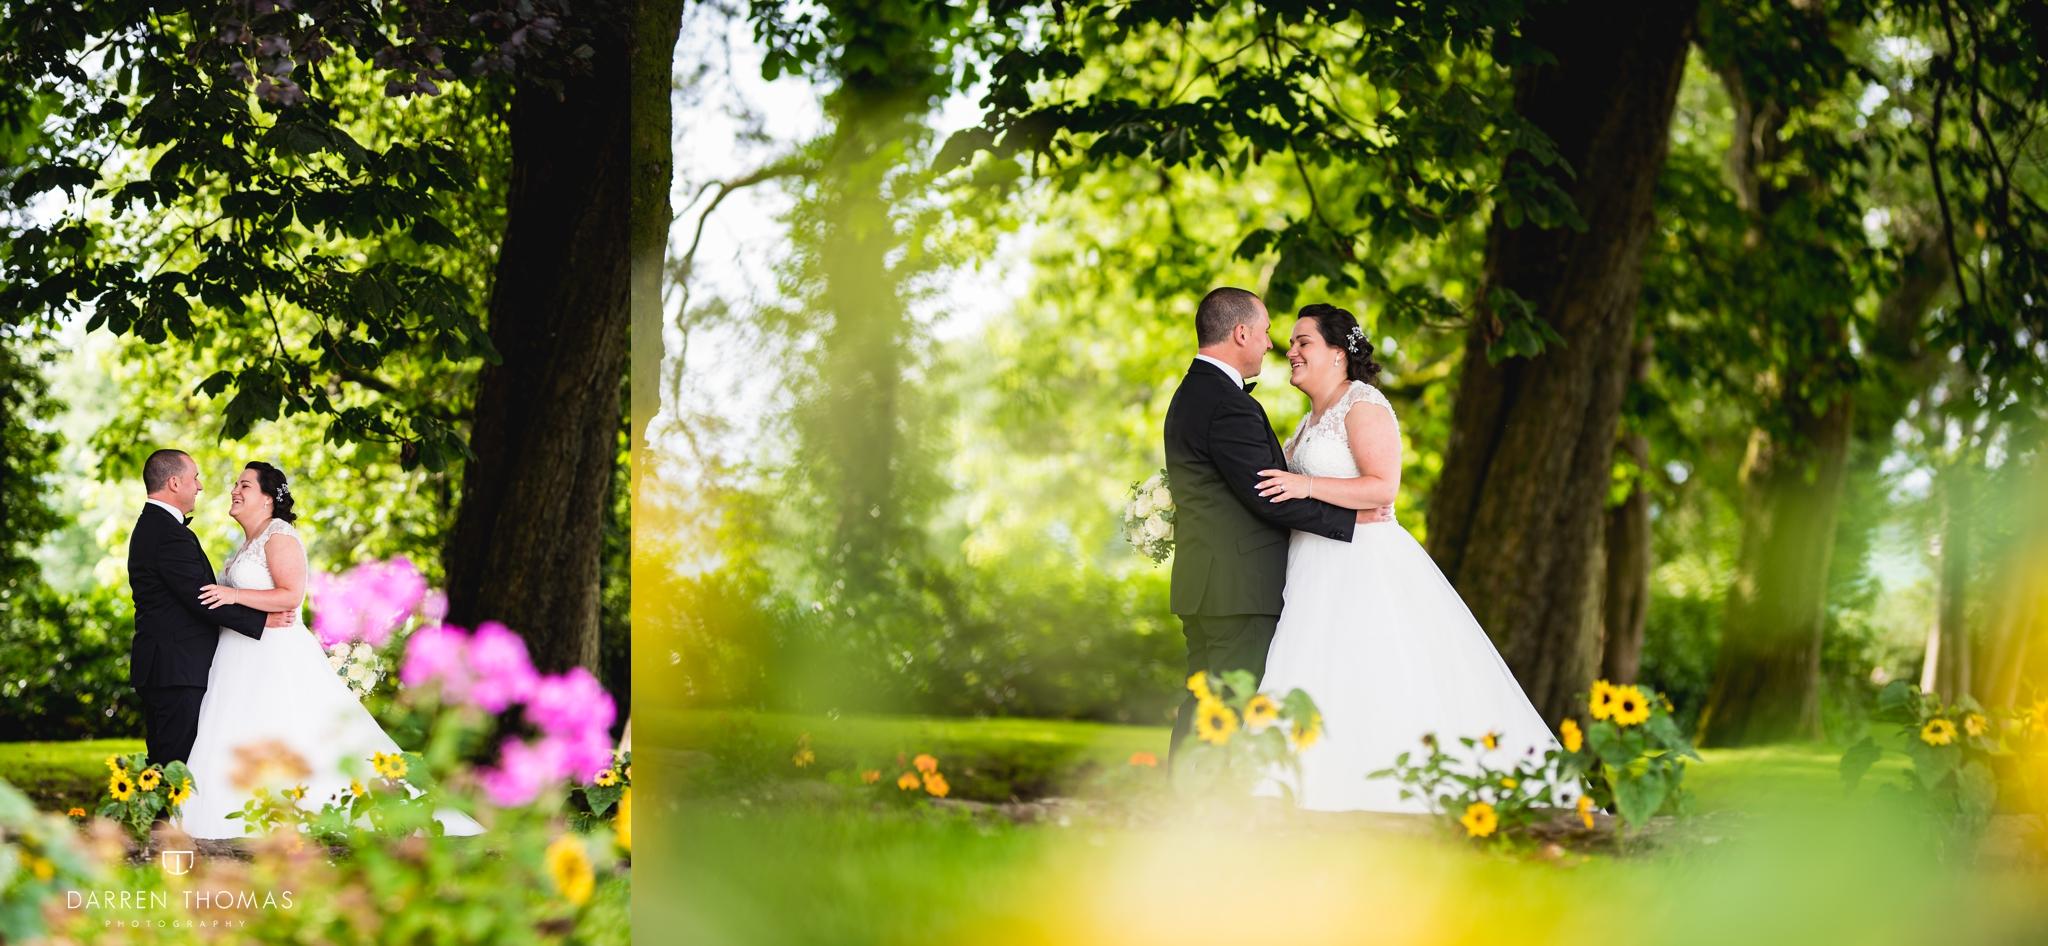 Llechwen-hall-wedding-photography17.jpg